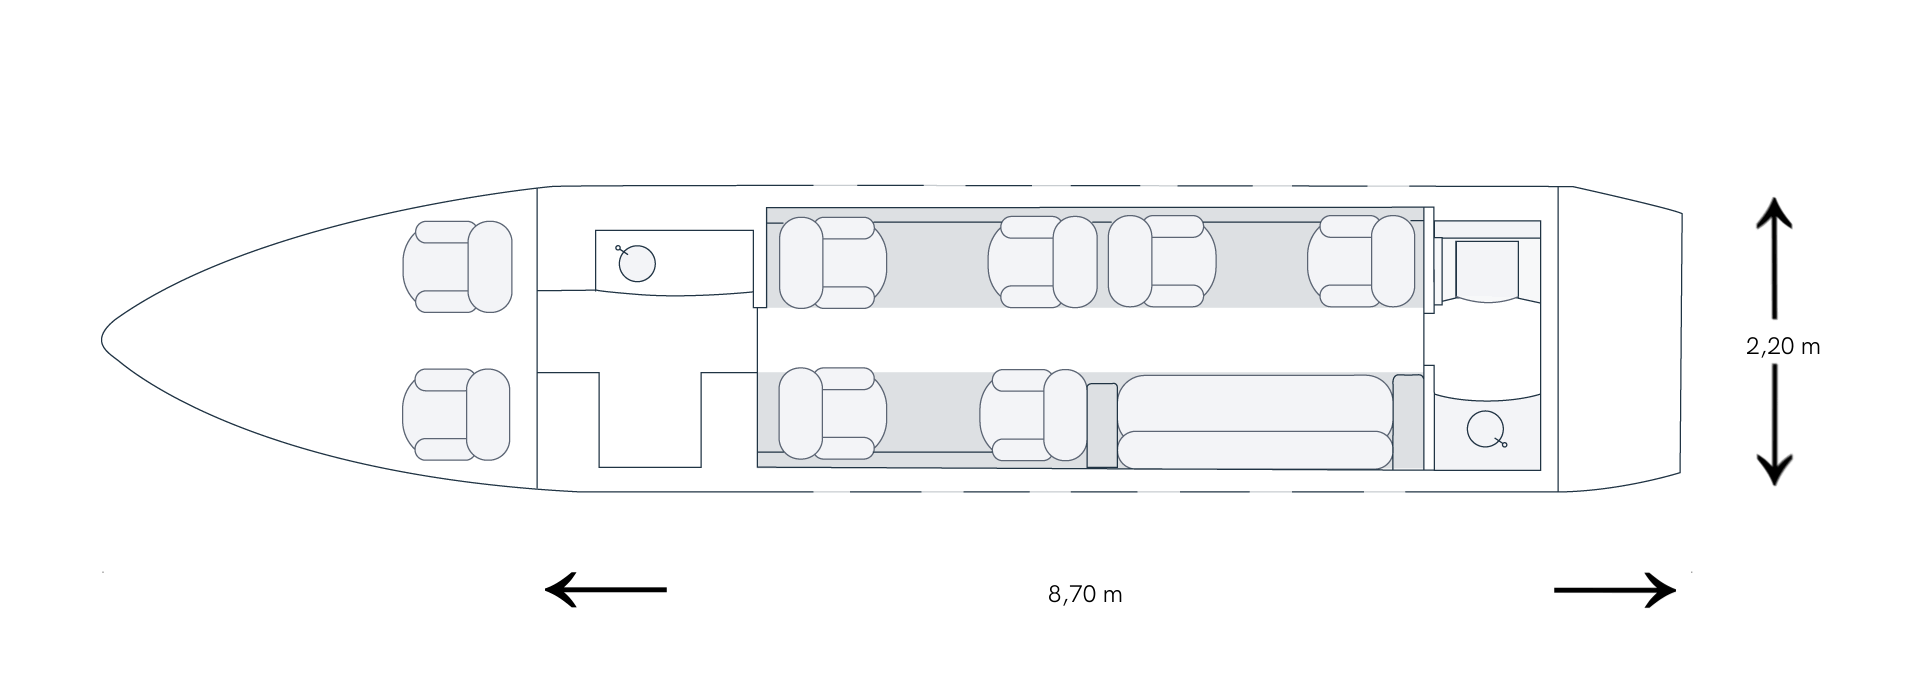 Grundriss eines BOMBARDIER Challenger 300 D-BUBI Privatjets